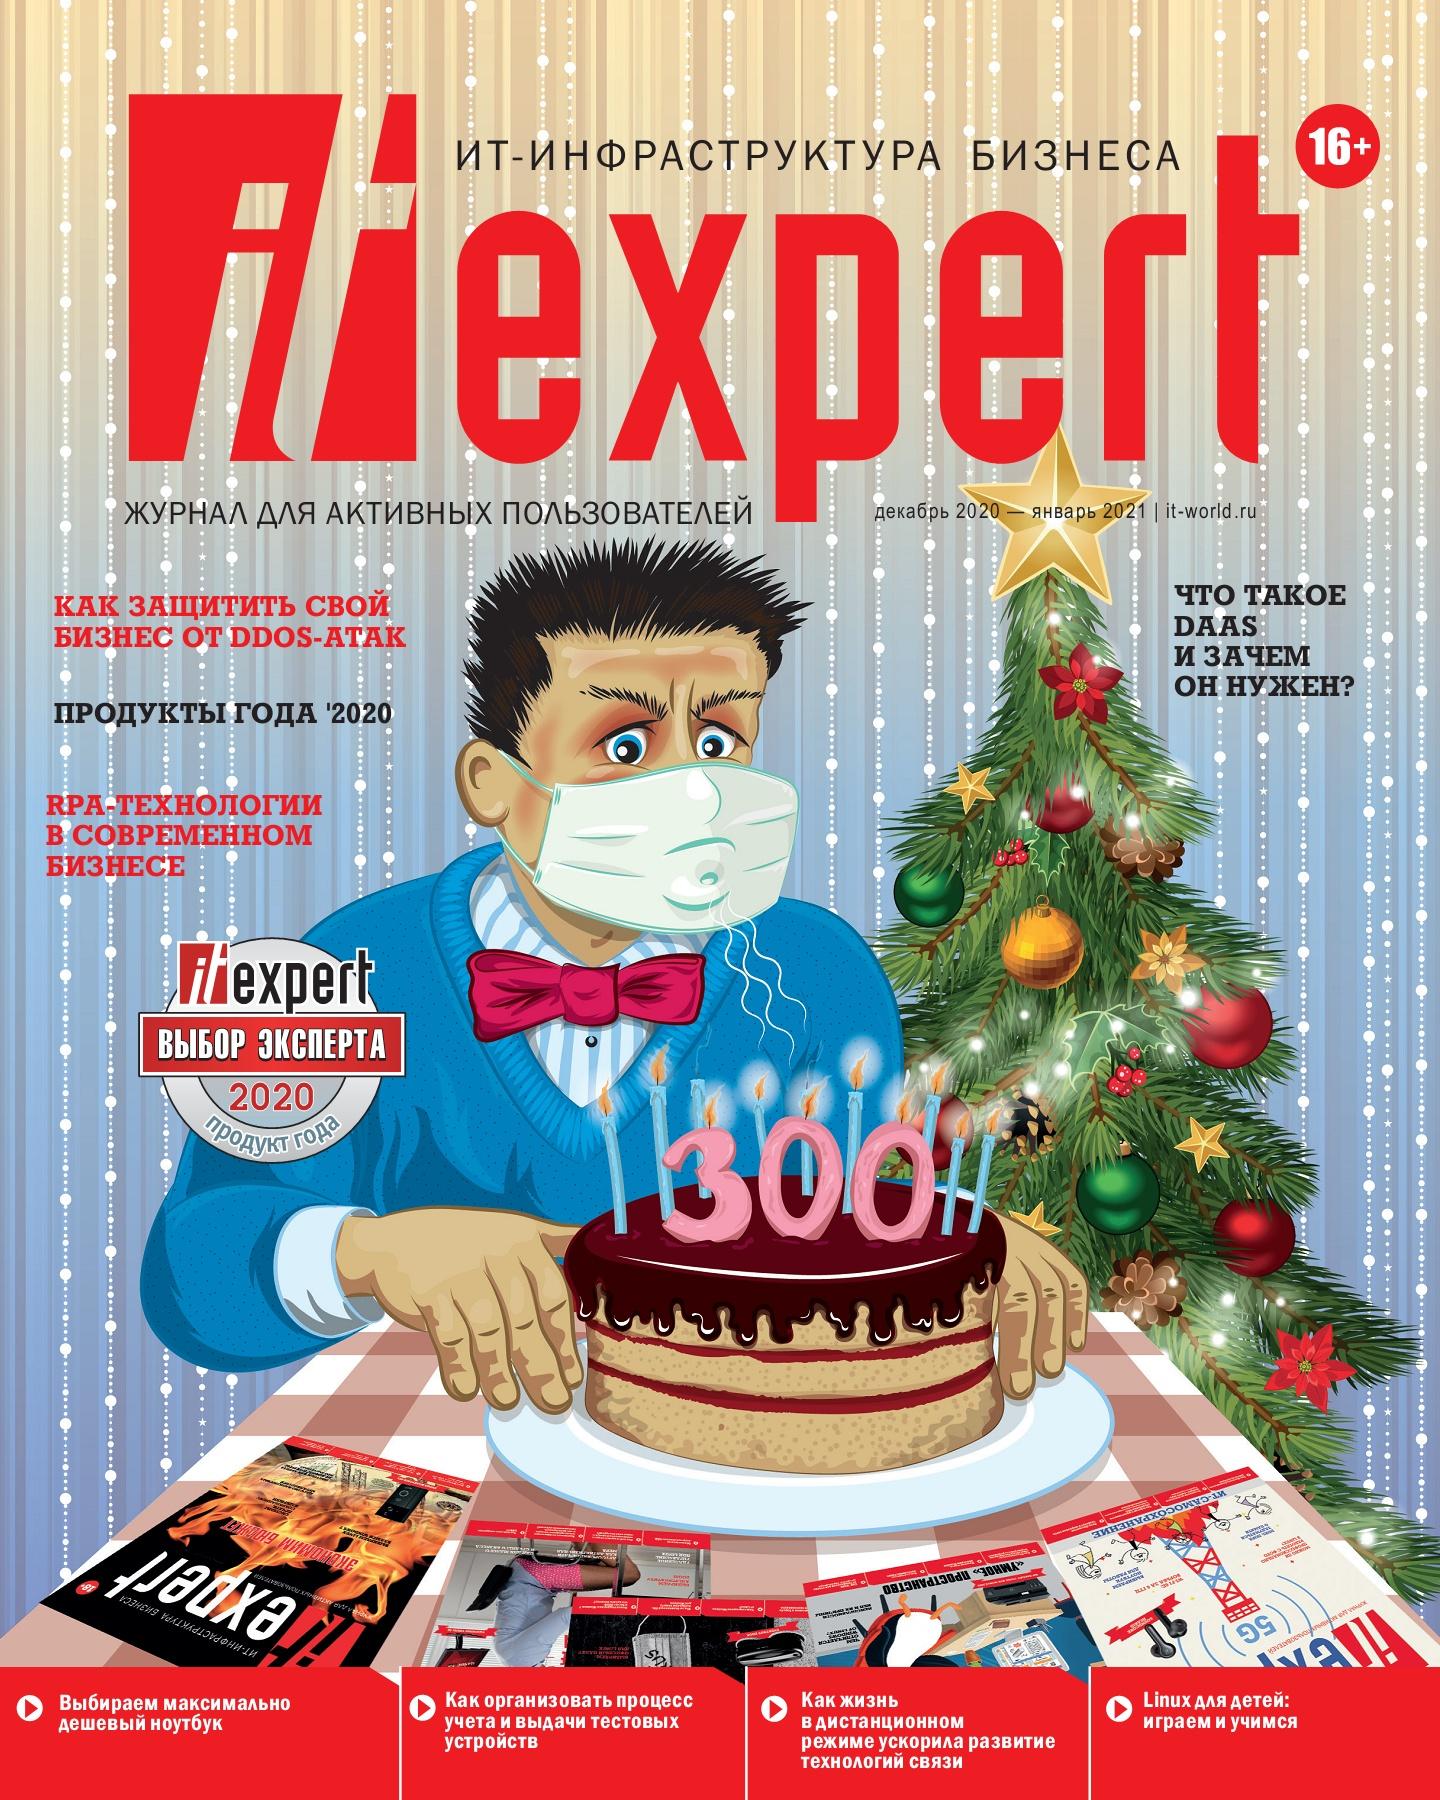 IT Expert №12-1, декабрь 2020 - январь 2021